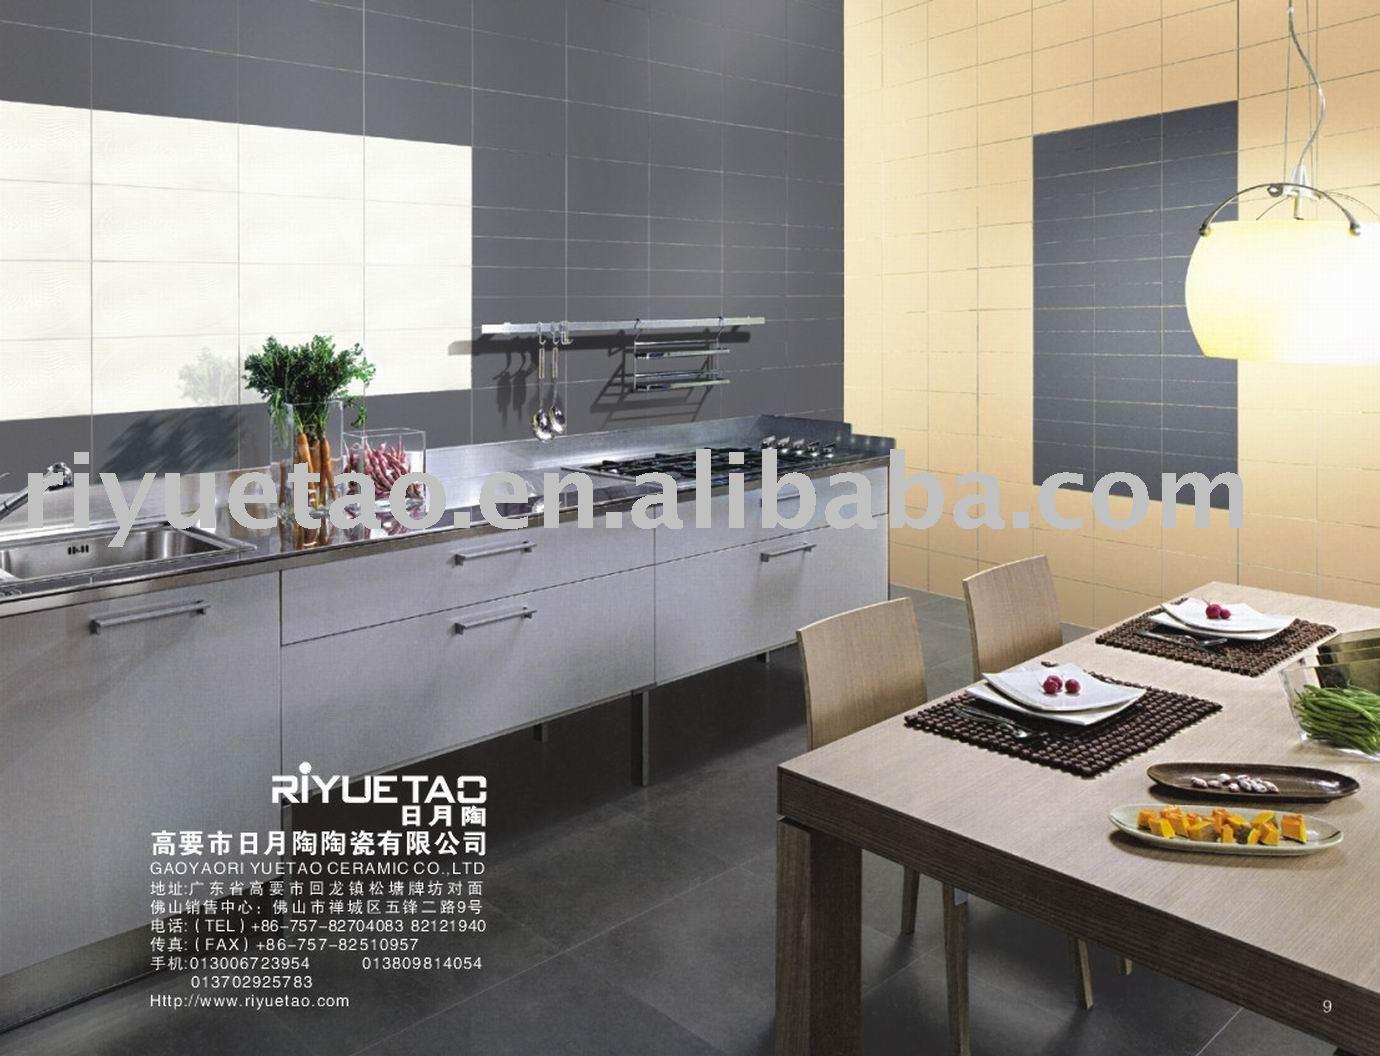 Kitchen Wall TilesInterior Wall TileCeramic Wall Tile